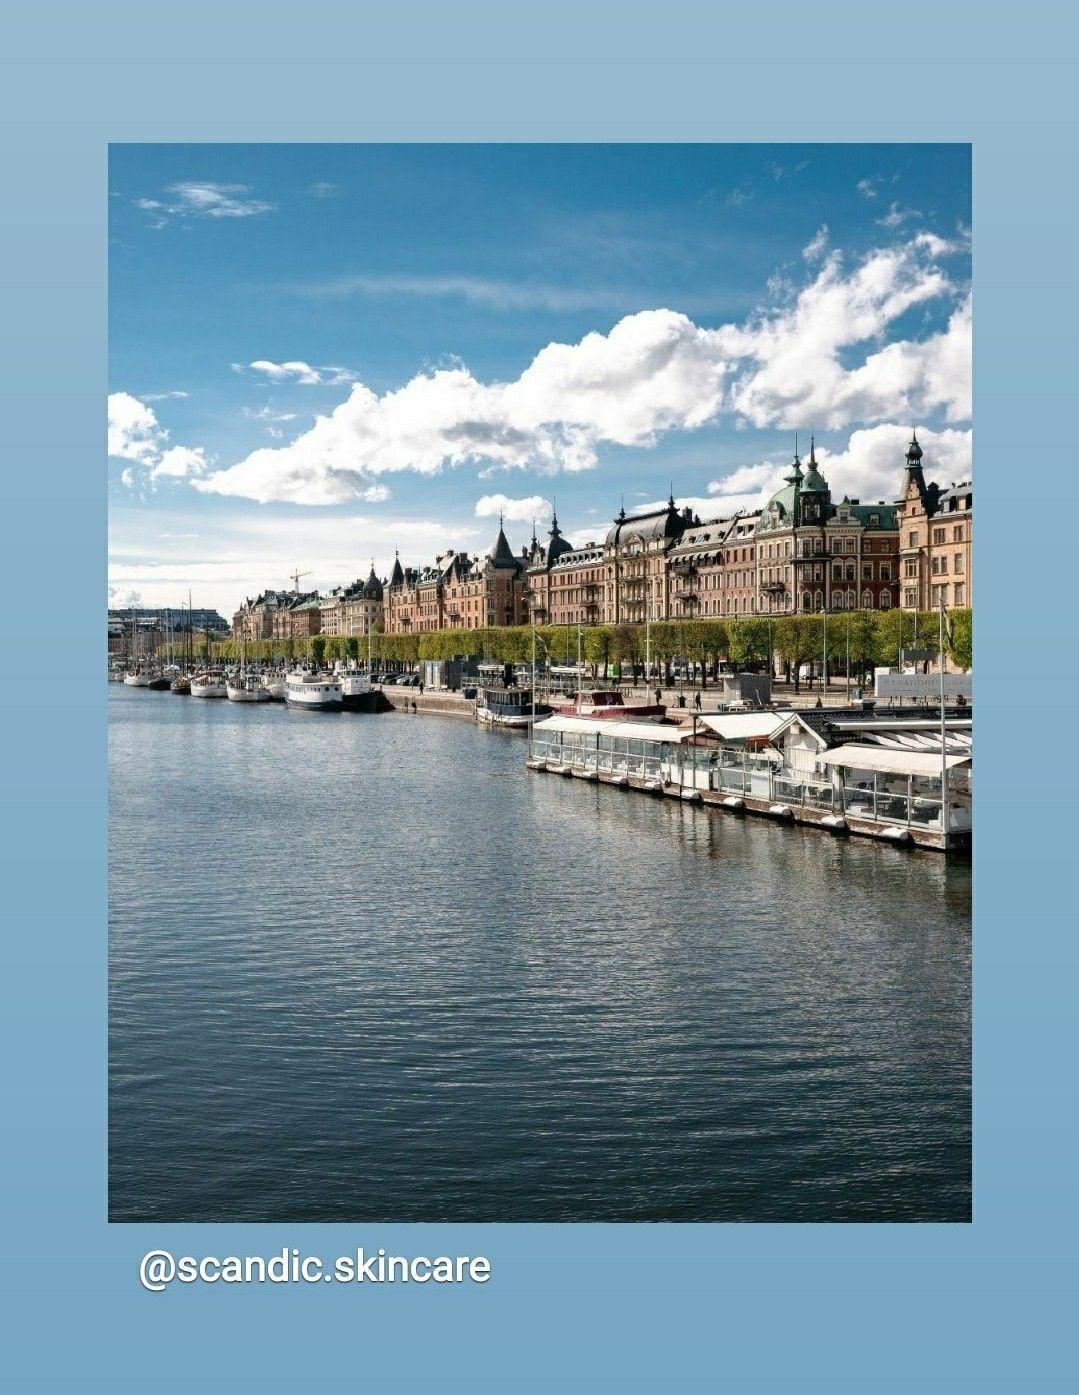 We'll be where the waters and sunshine are. 🌊  Via @visitstockholm . . . #scandic #scandicbeauty #sbeauty #crueltyfreebeauty #womanowned #glutenfree #scandicskincare #swedishskincare #sourcedinsweden #swedishbeauty #visitstockholm #travelpicsdaily #waterside #travelphotography📷 #travel_capture #phototravel #happyplaces